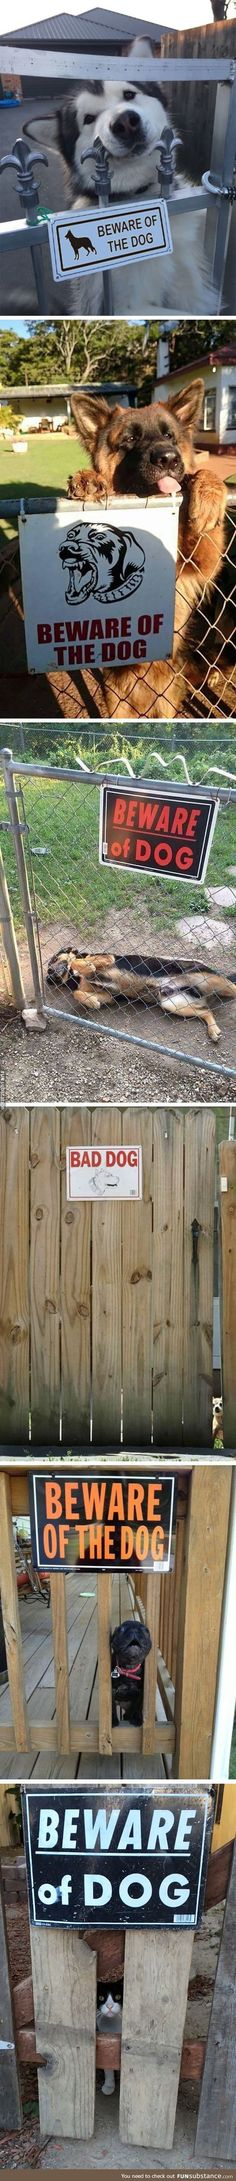 Beware of the dog,jajaja too cute to be true